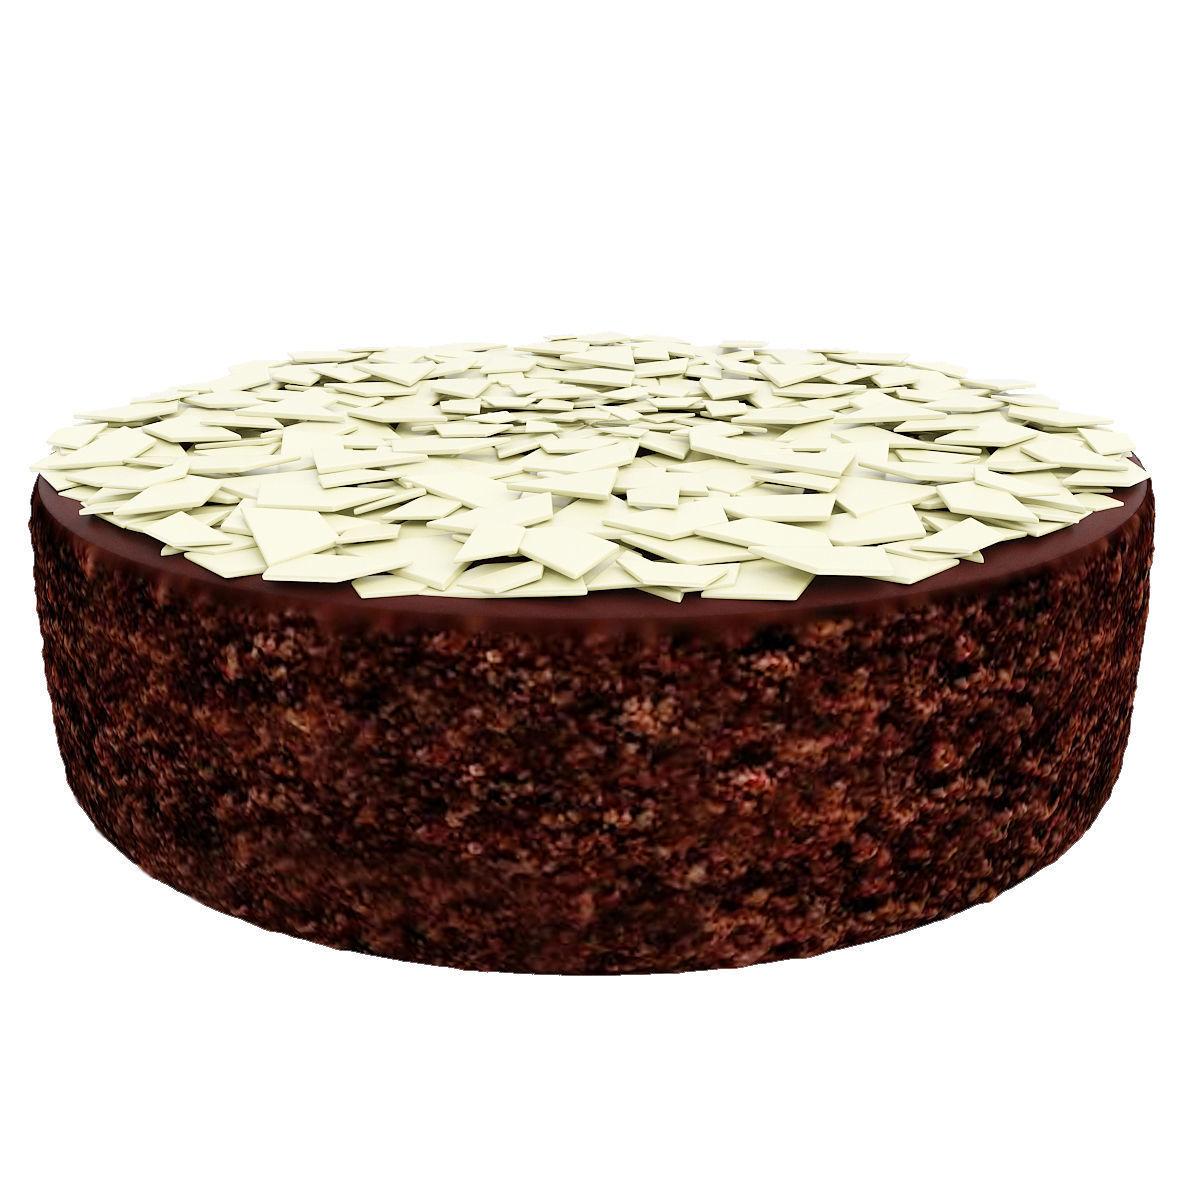 Chocolate cake with white chocolate